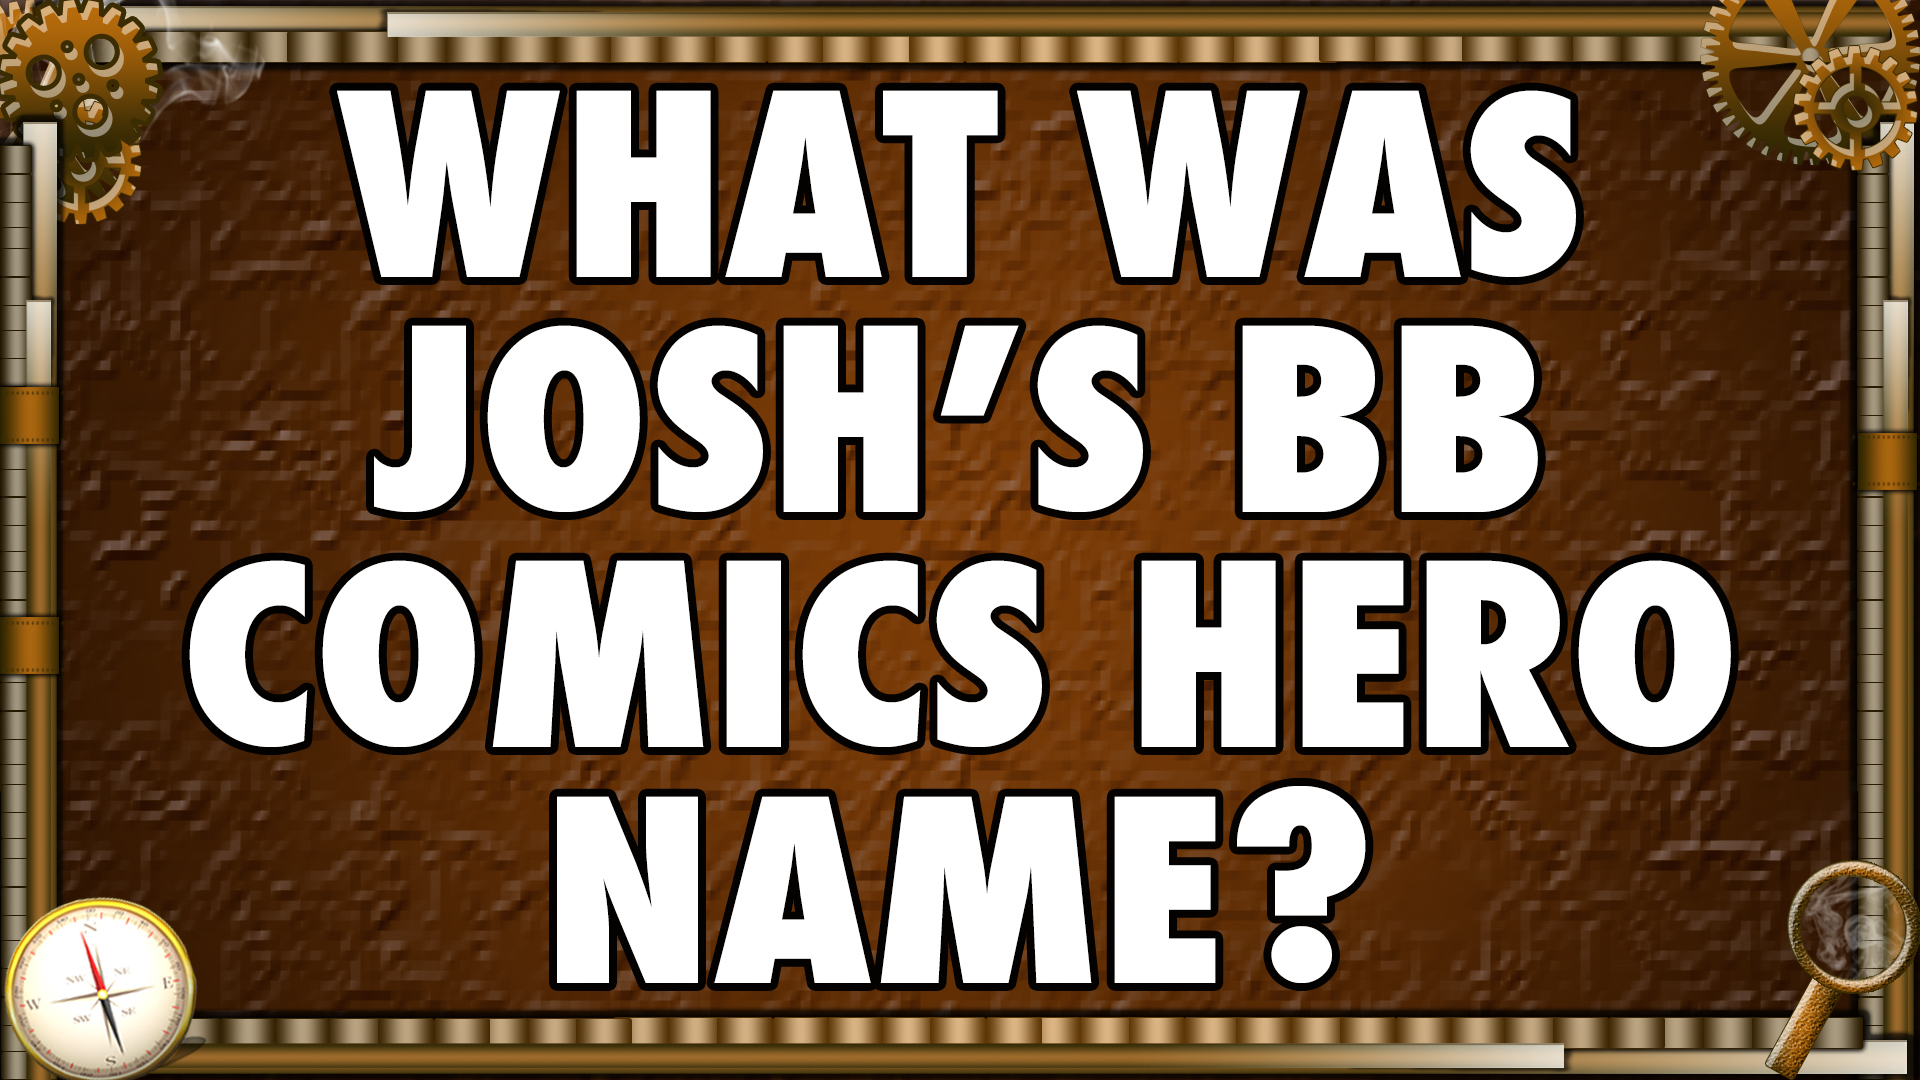 What was Josh's BB Comics hero name?